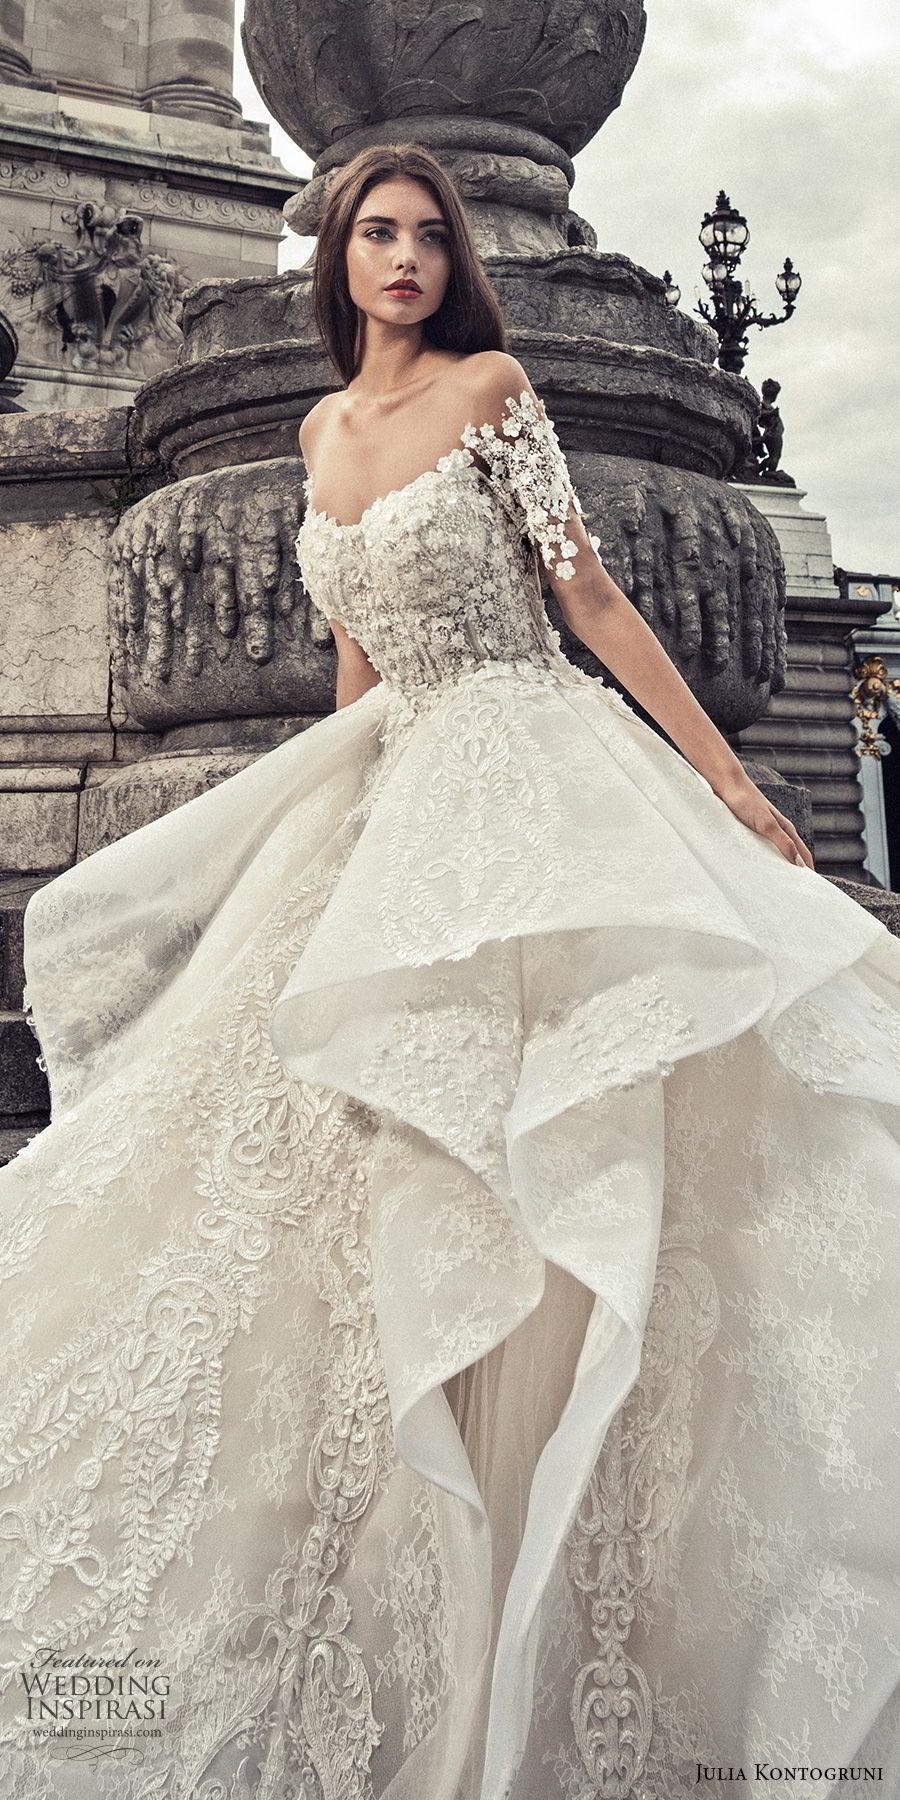 julia kontogruni 2018 bridal half sleeves off shoulder sweetheart neckline full embellishment peplum layered skirt ball gown wedding dress sheer button royal train (4) zv